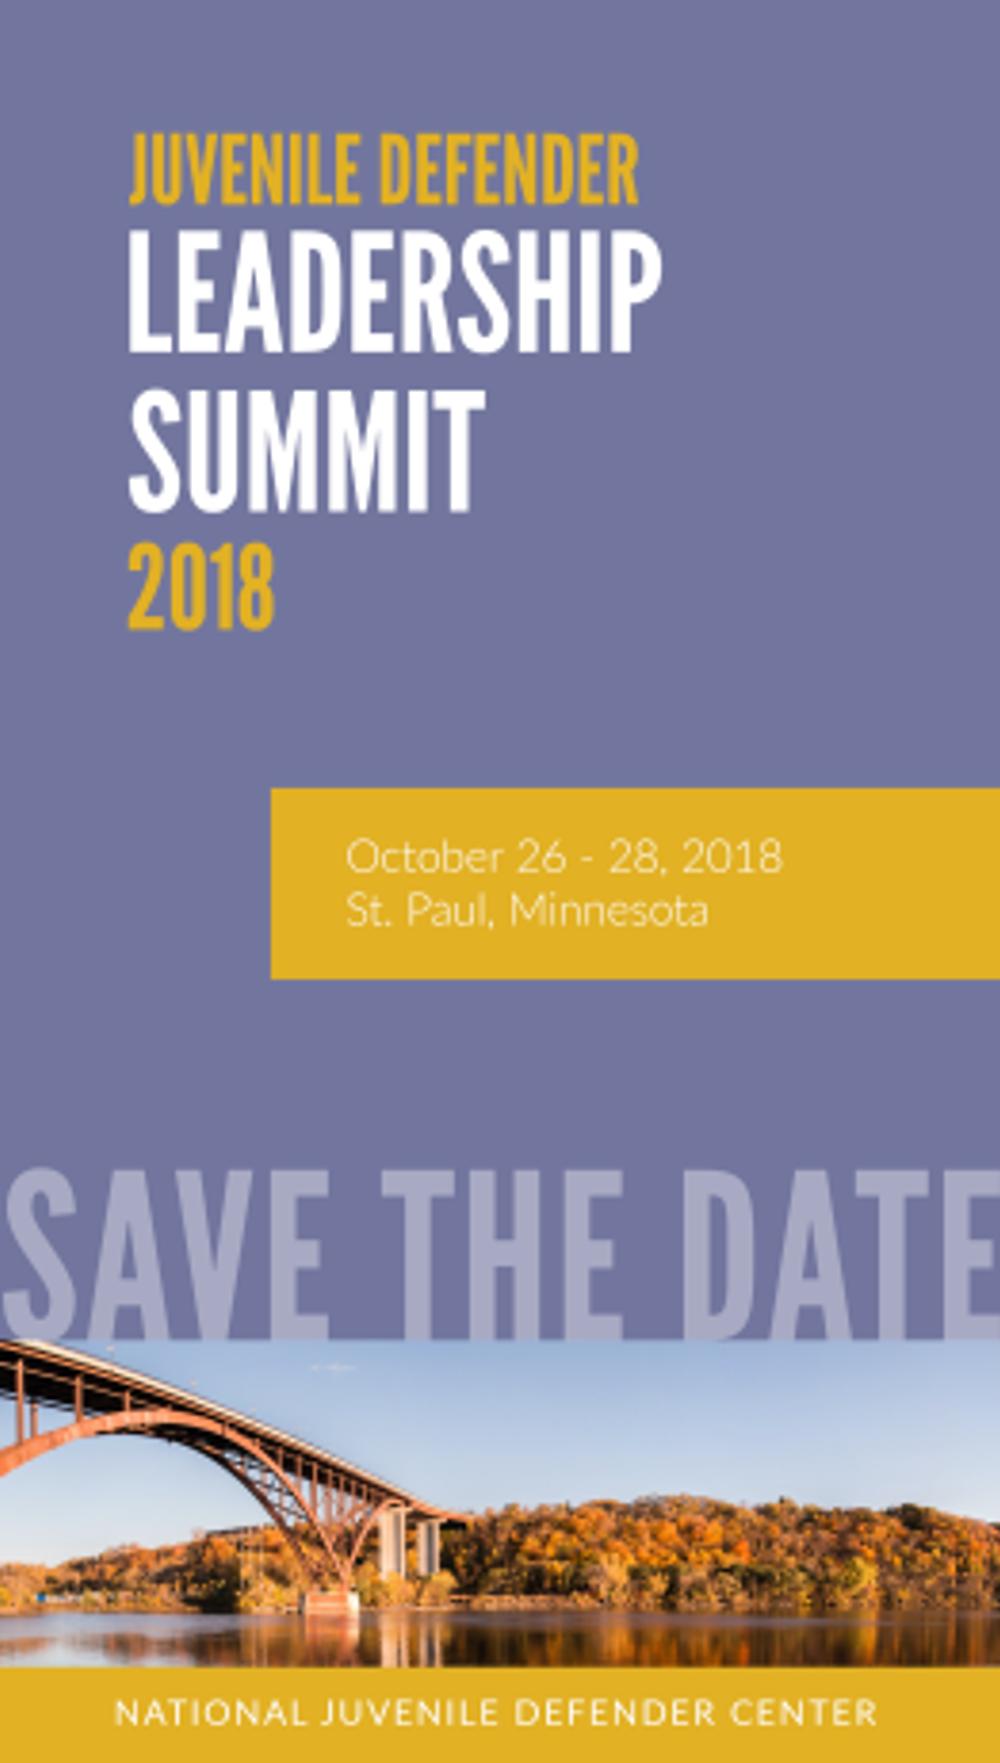 JD Leadship Summit 2018